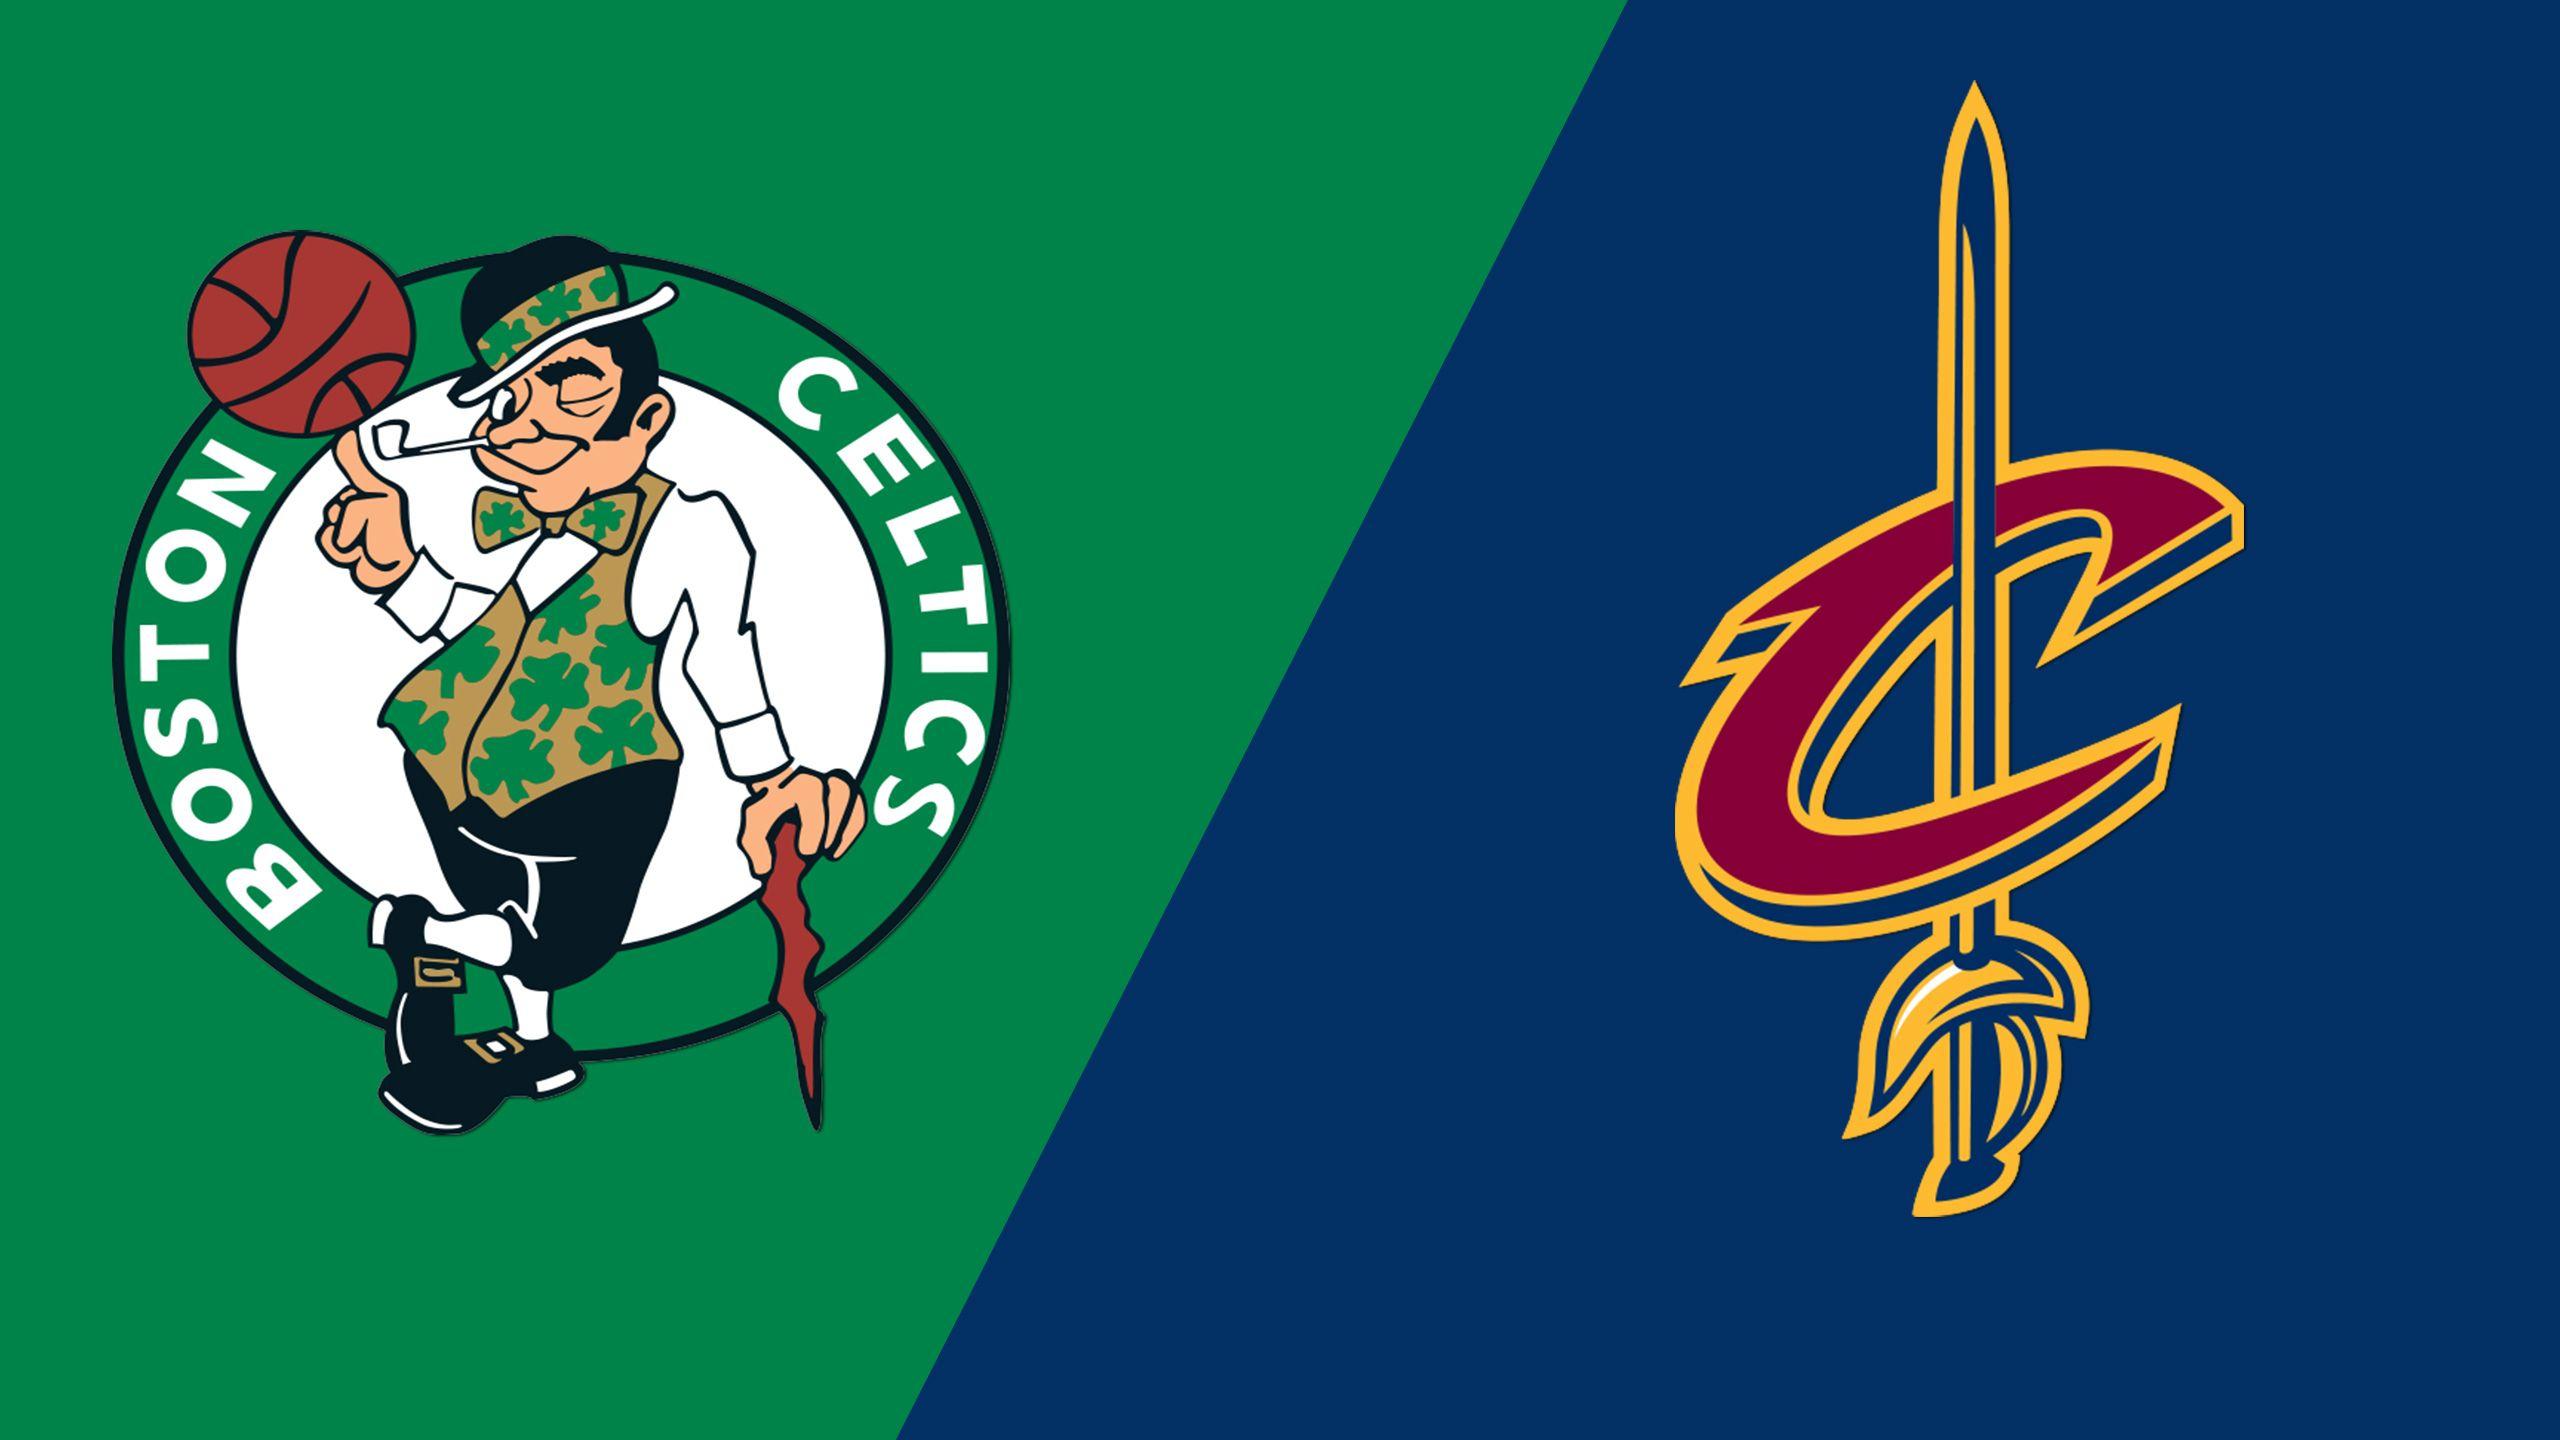 Boston Celtics vs. Cleveland Cavaliers (Conference Finals Game 3)